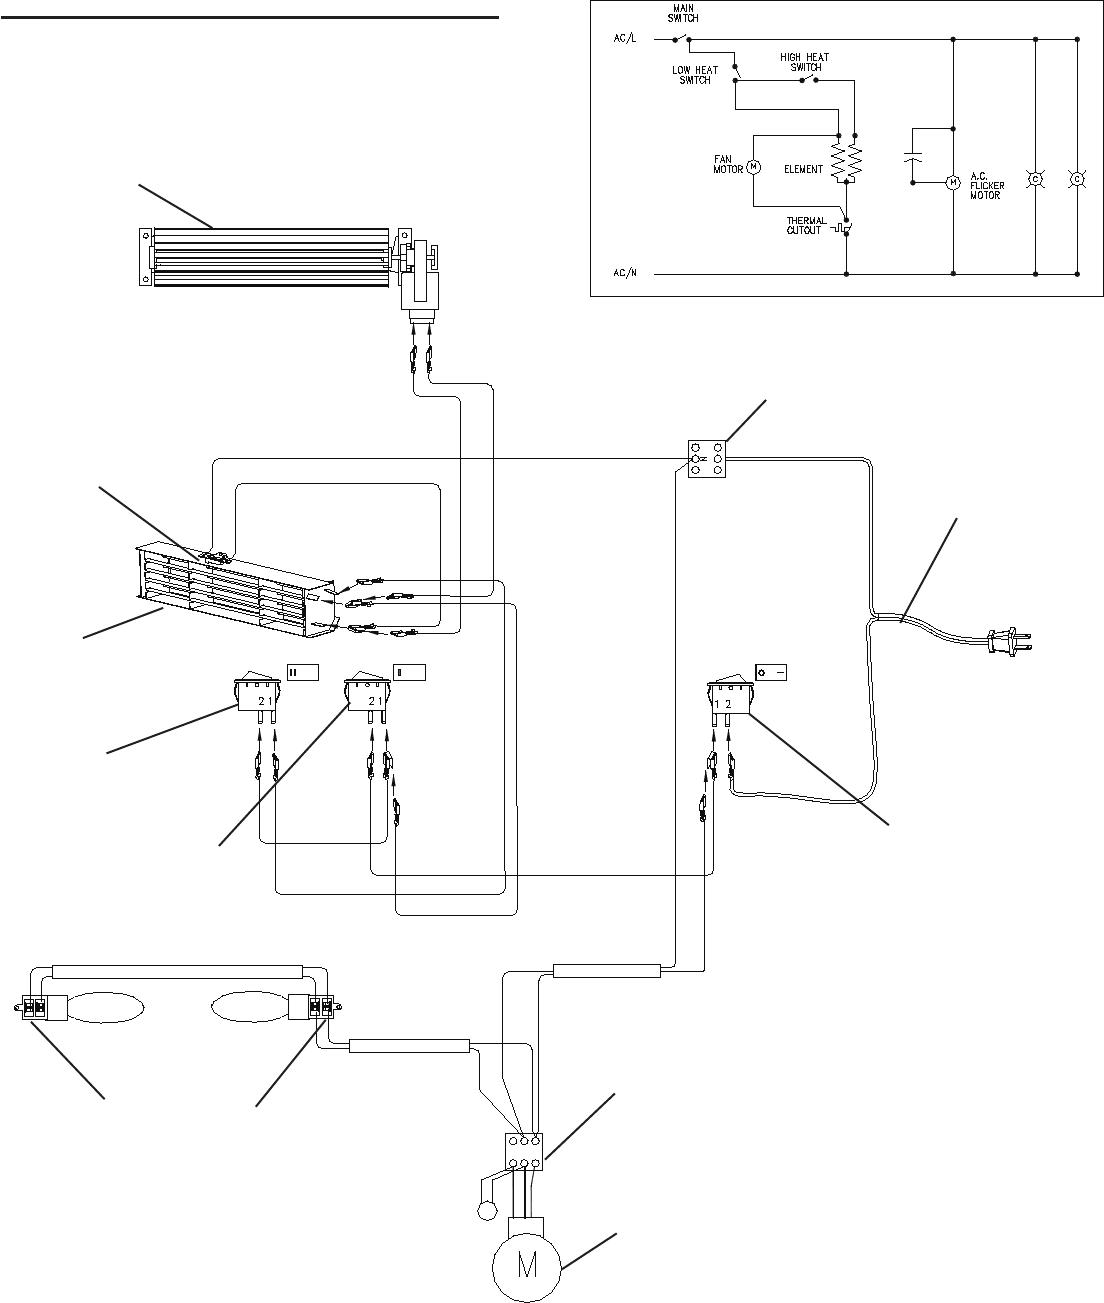 Dimplex Electric Baseboard Heater Wiring Diagram